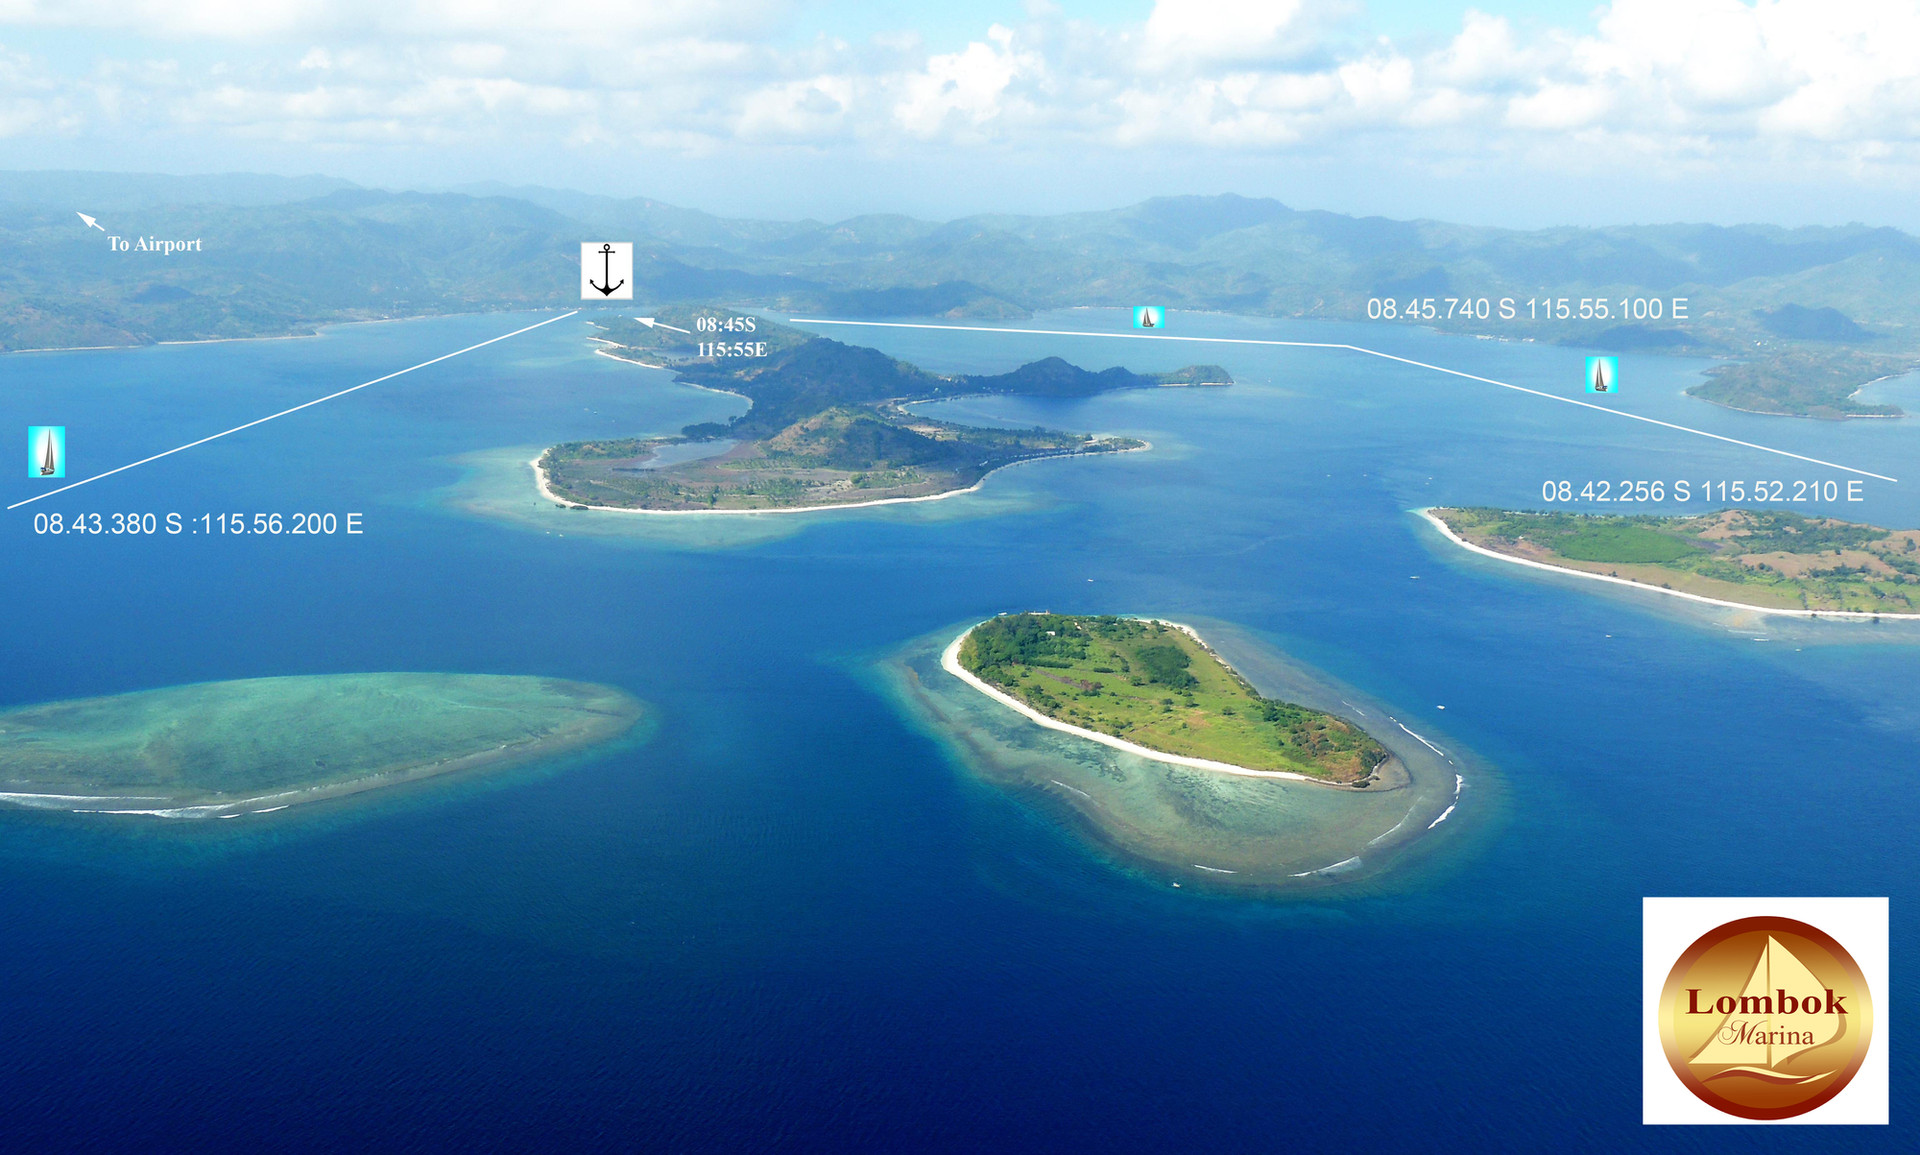 Lombok Marina Navigation Approaches